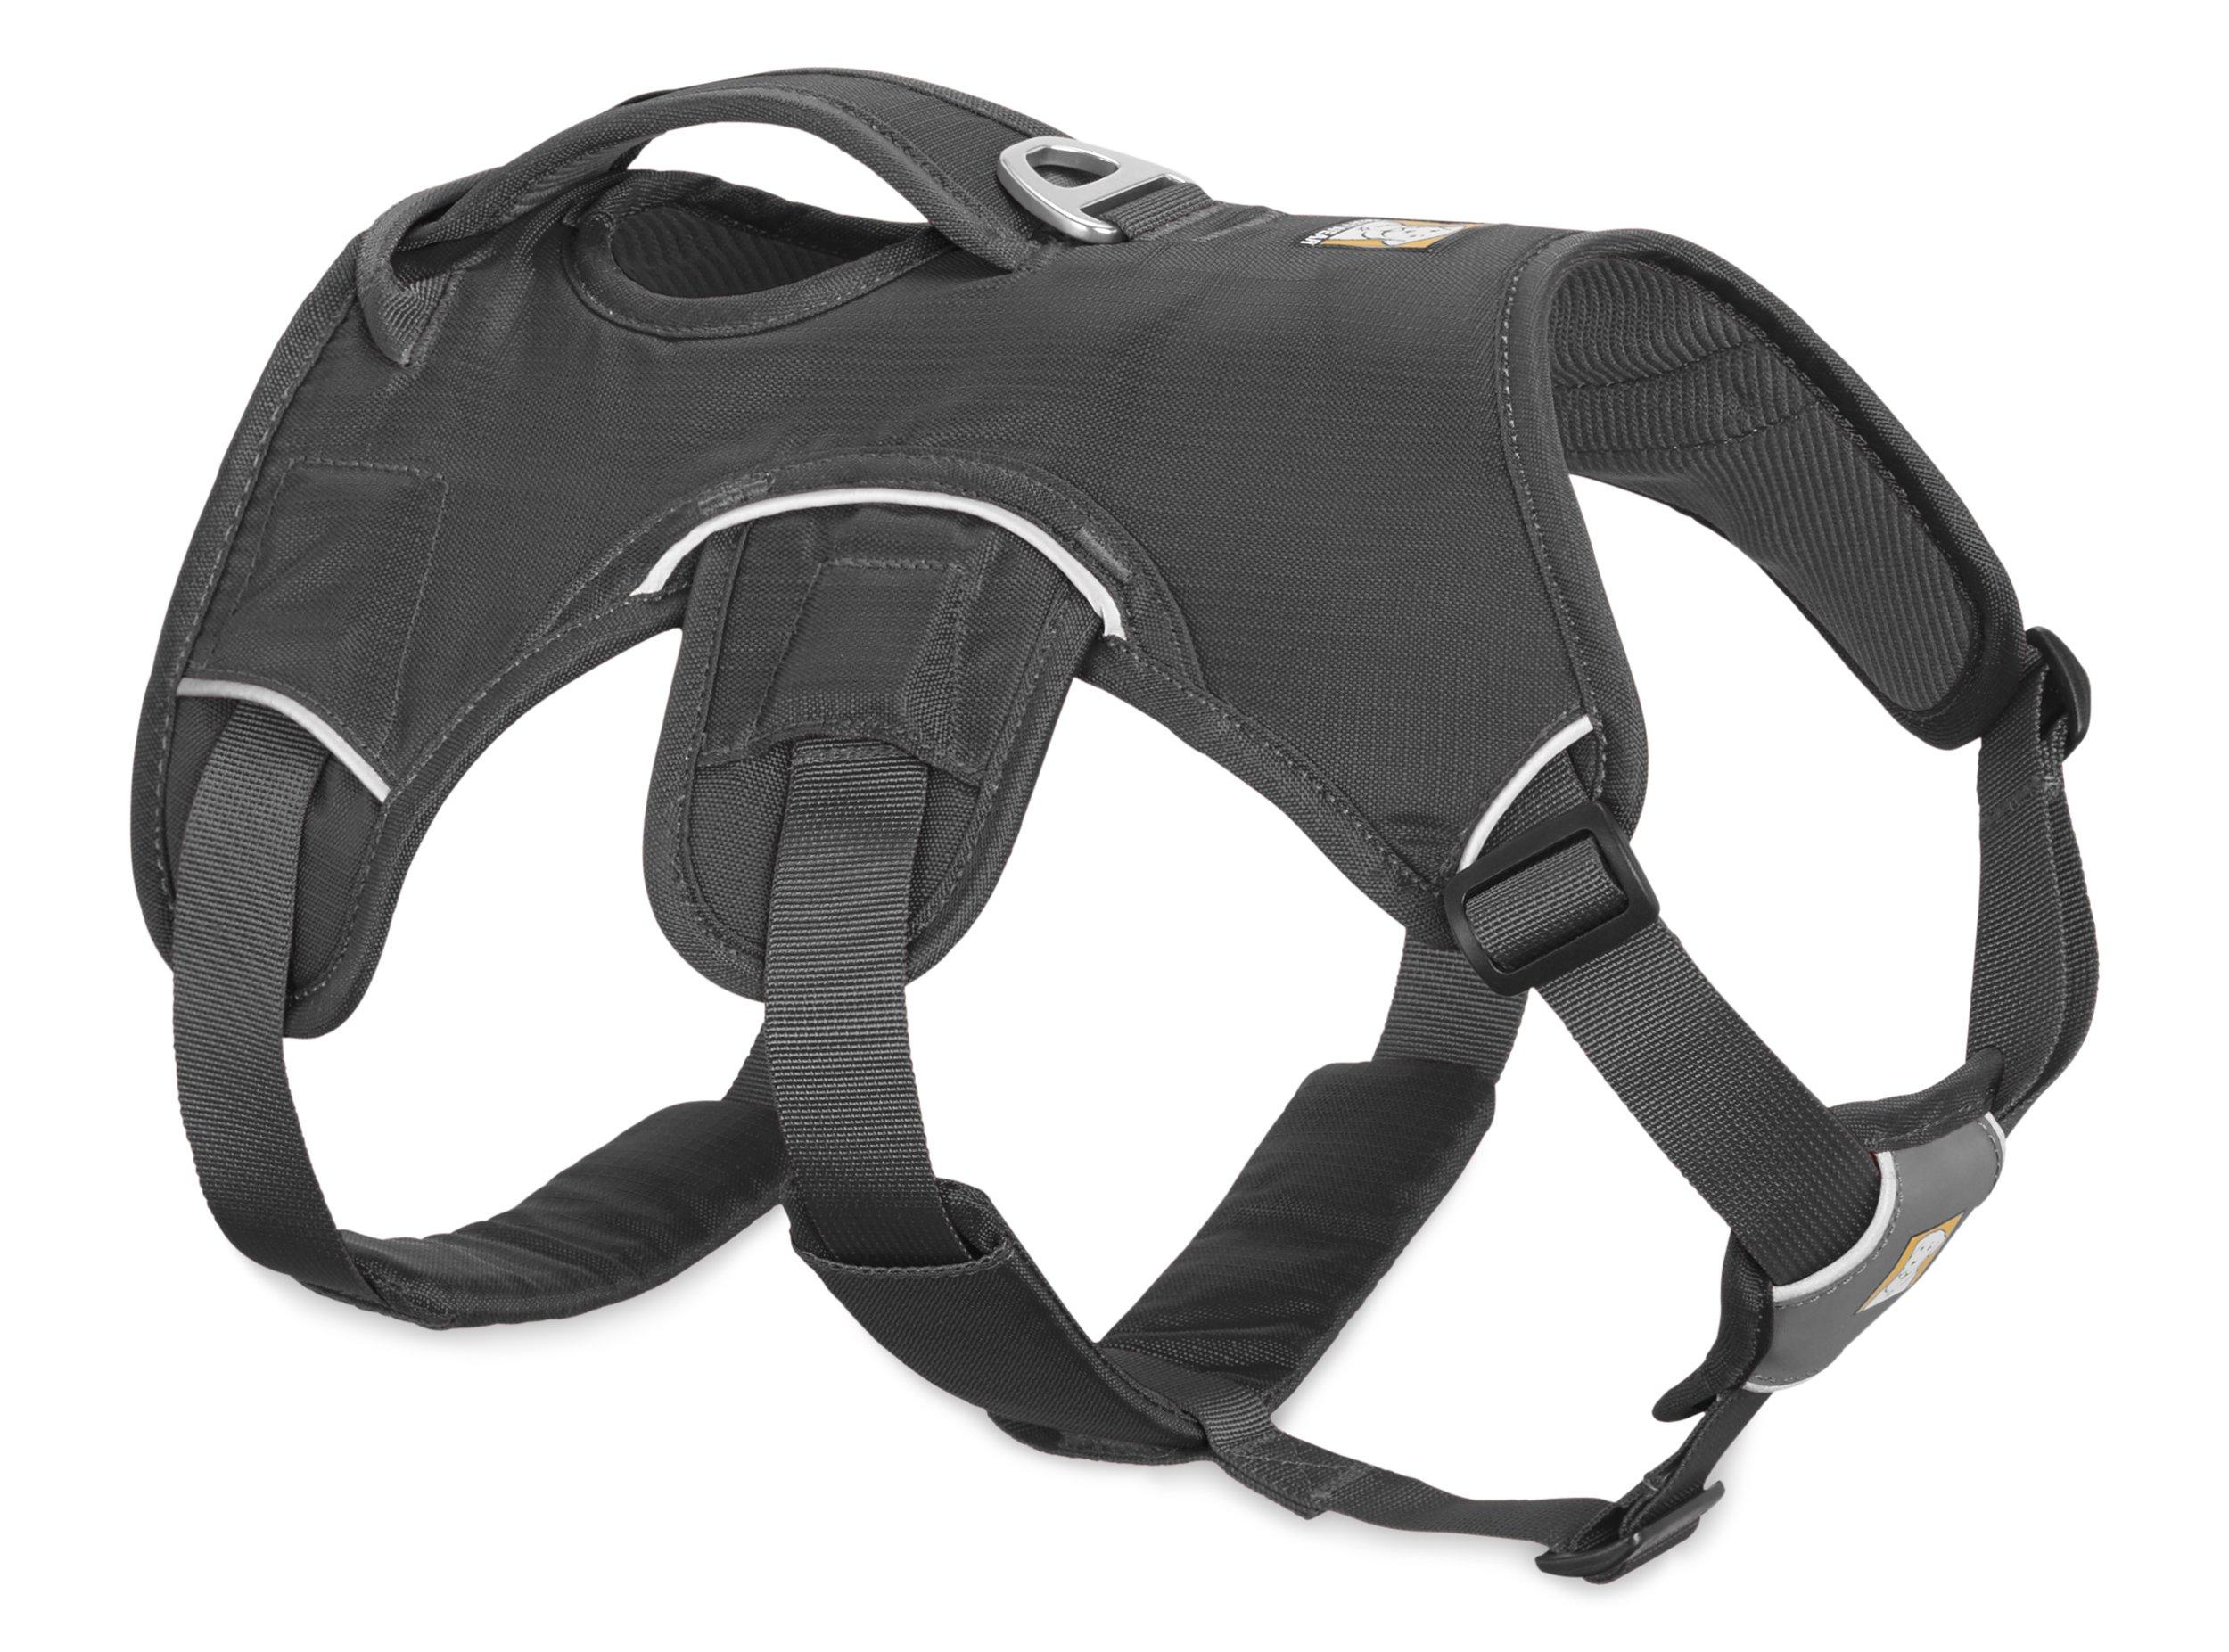 RUFFWEAR - Web Master, Multi-Use Support Dog Harness, Hiking and Trail Running, Service and Working, Everyday Wear, Twilight Gray, Medium by RUFFWEAR